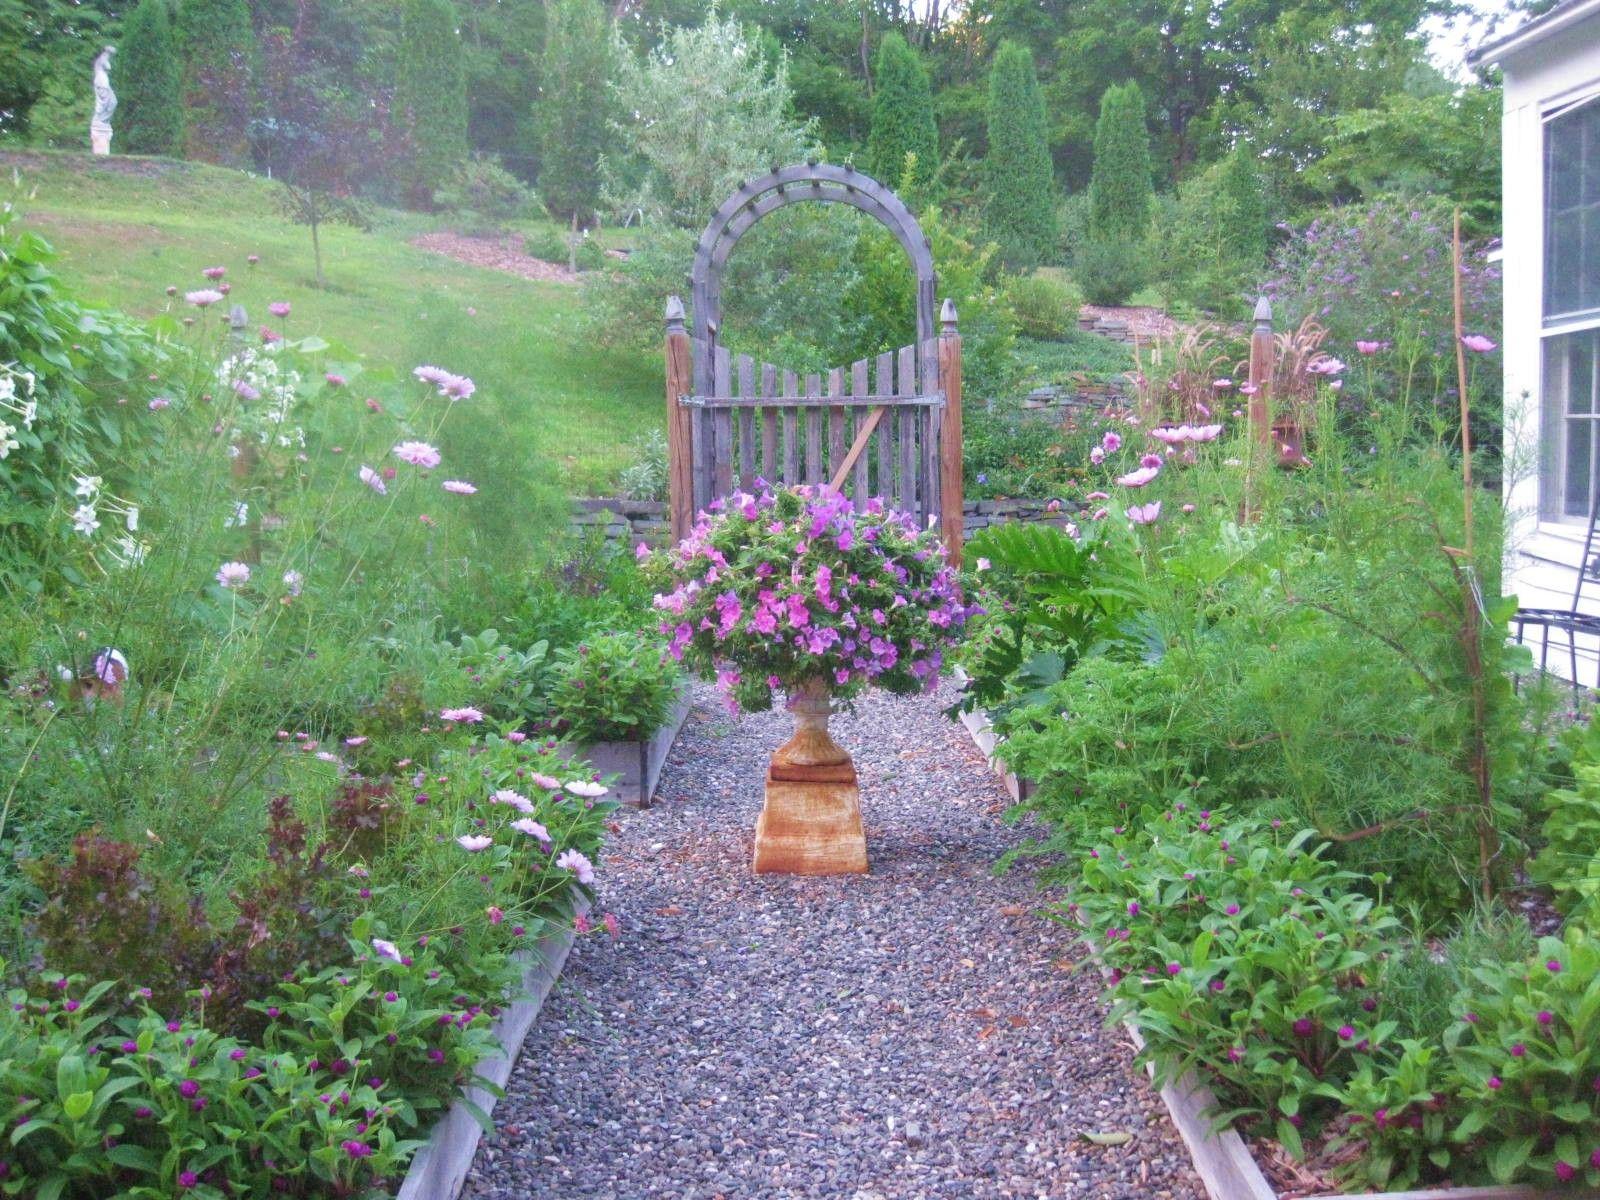 Creating a Raised Bed Garden Vegetable garden raised